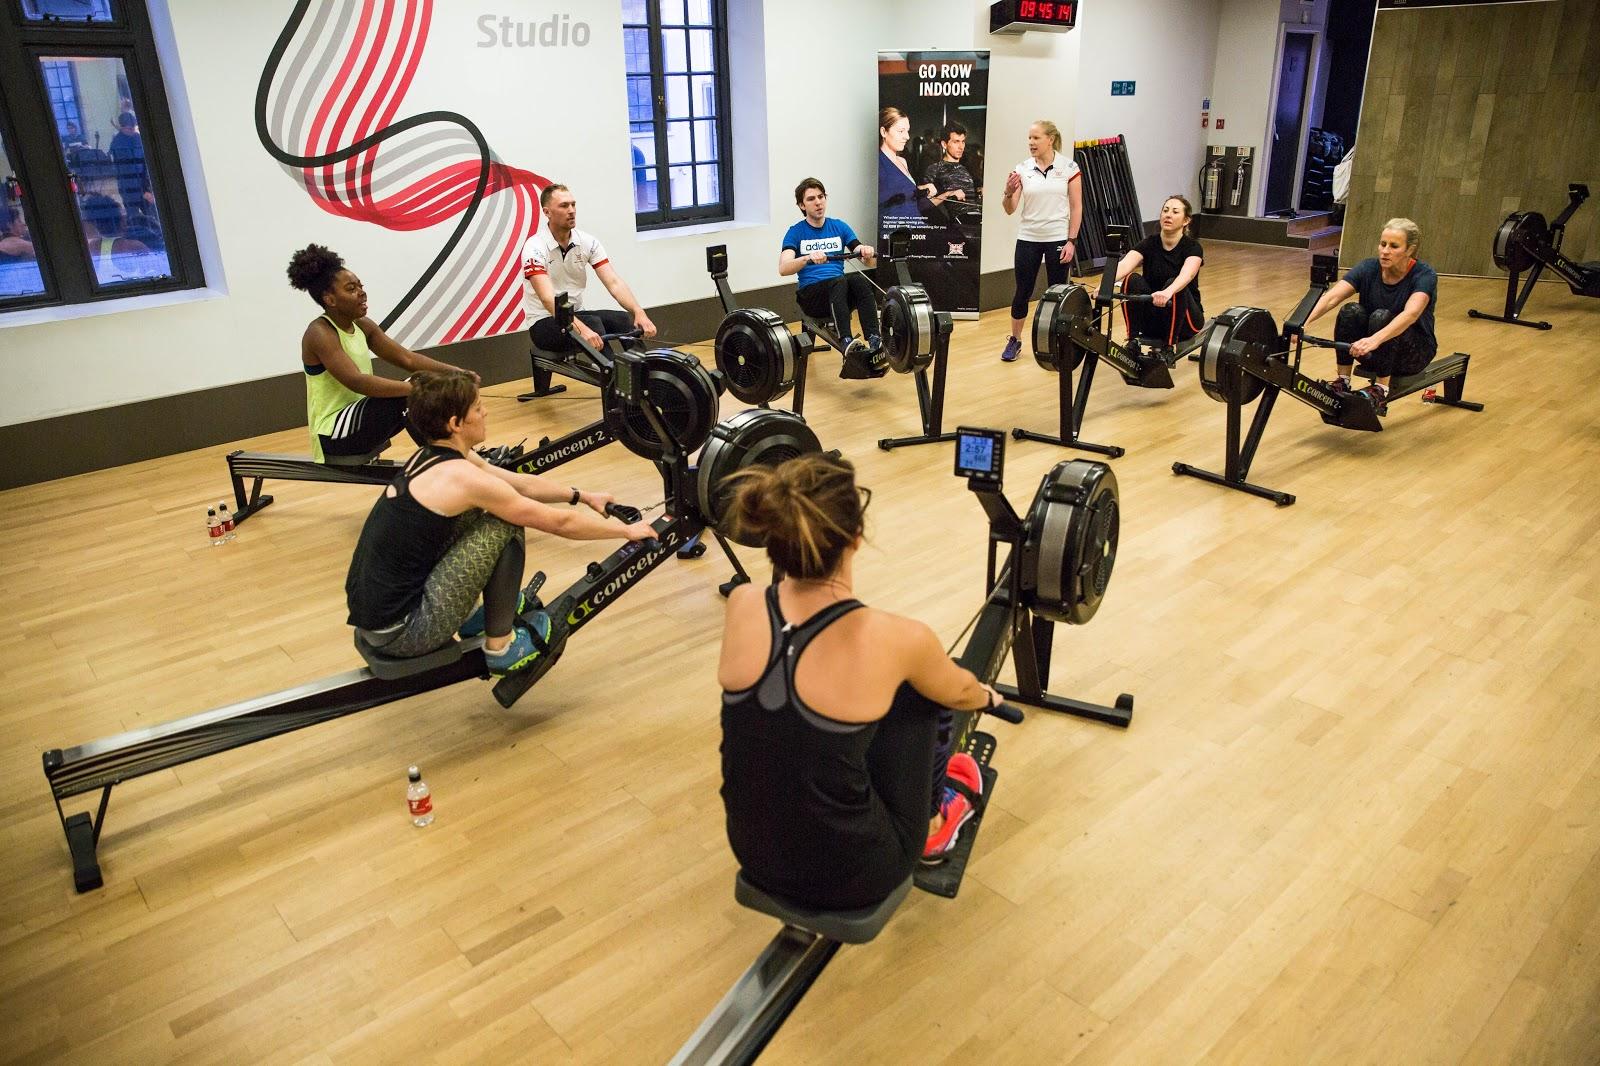 Go Row Indoor with British Rowing